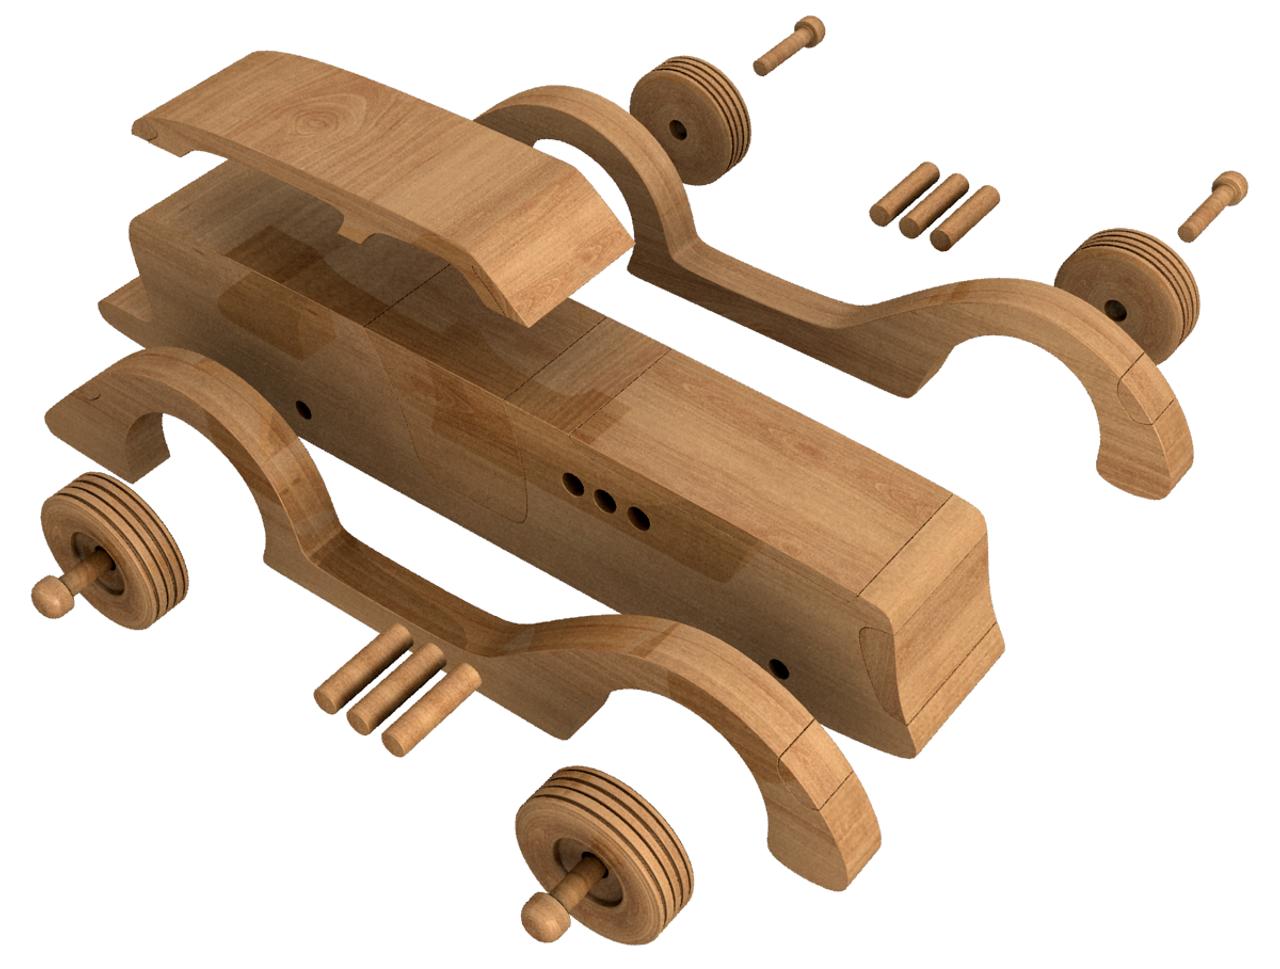 1935 ciccarelli custom duo plus teardrop trailer wood toy plans (2 pdf  downloads)